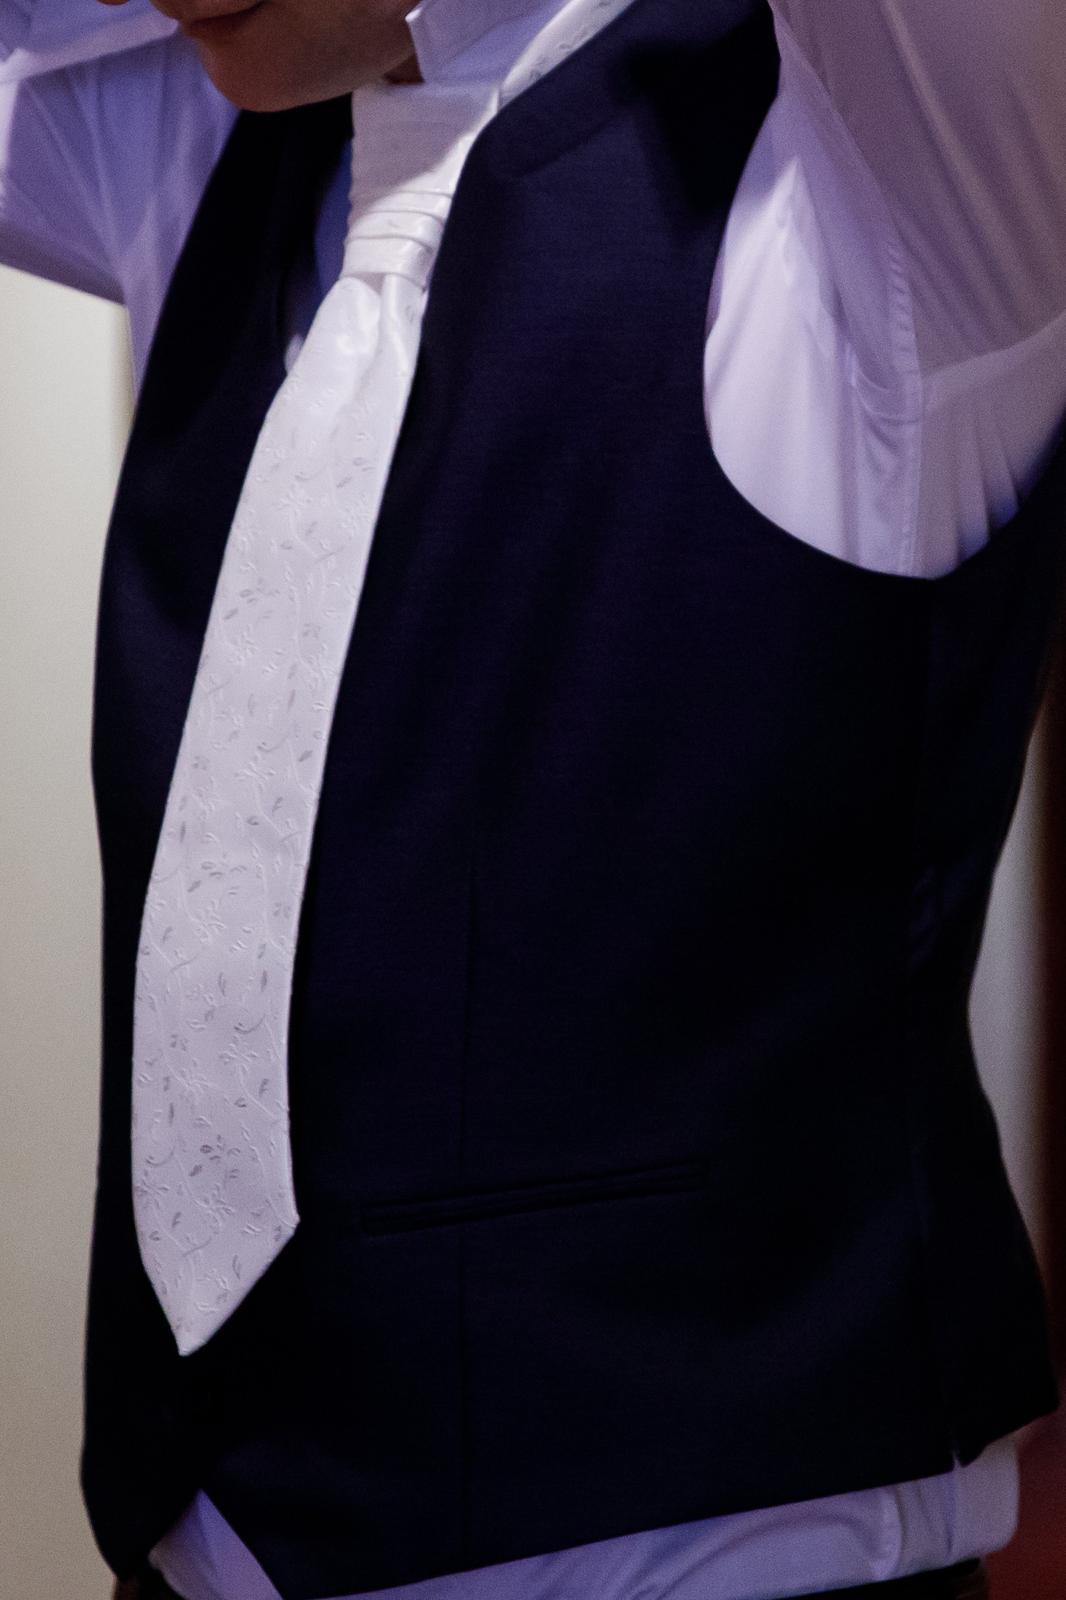 Svadobná kravata s vreckovkou - Obrázok č. 2